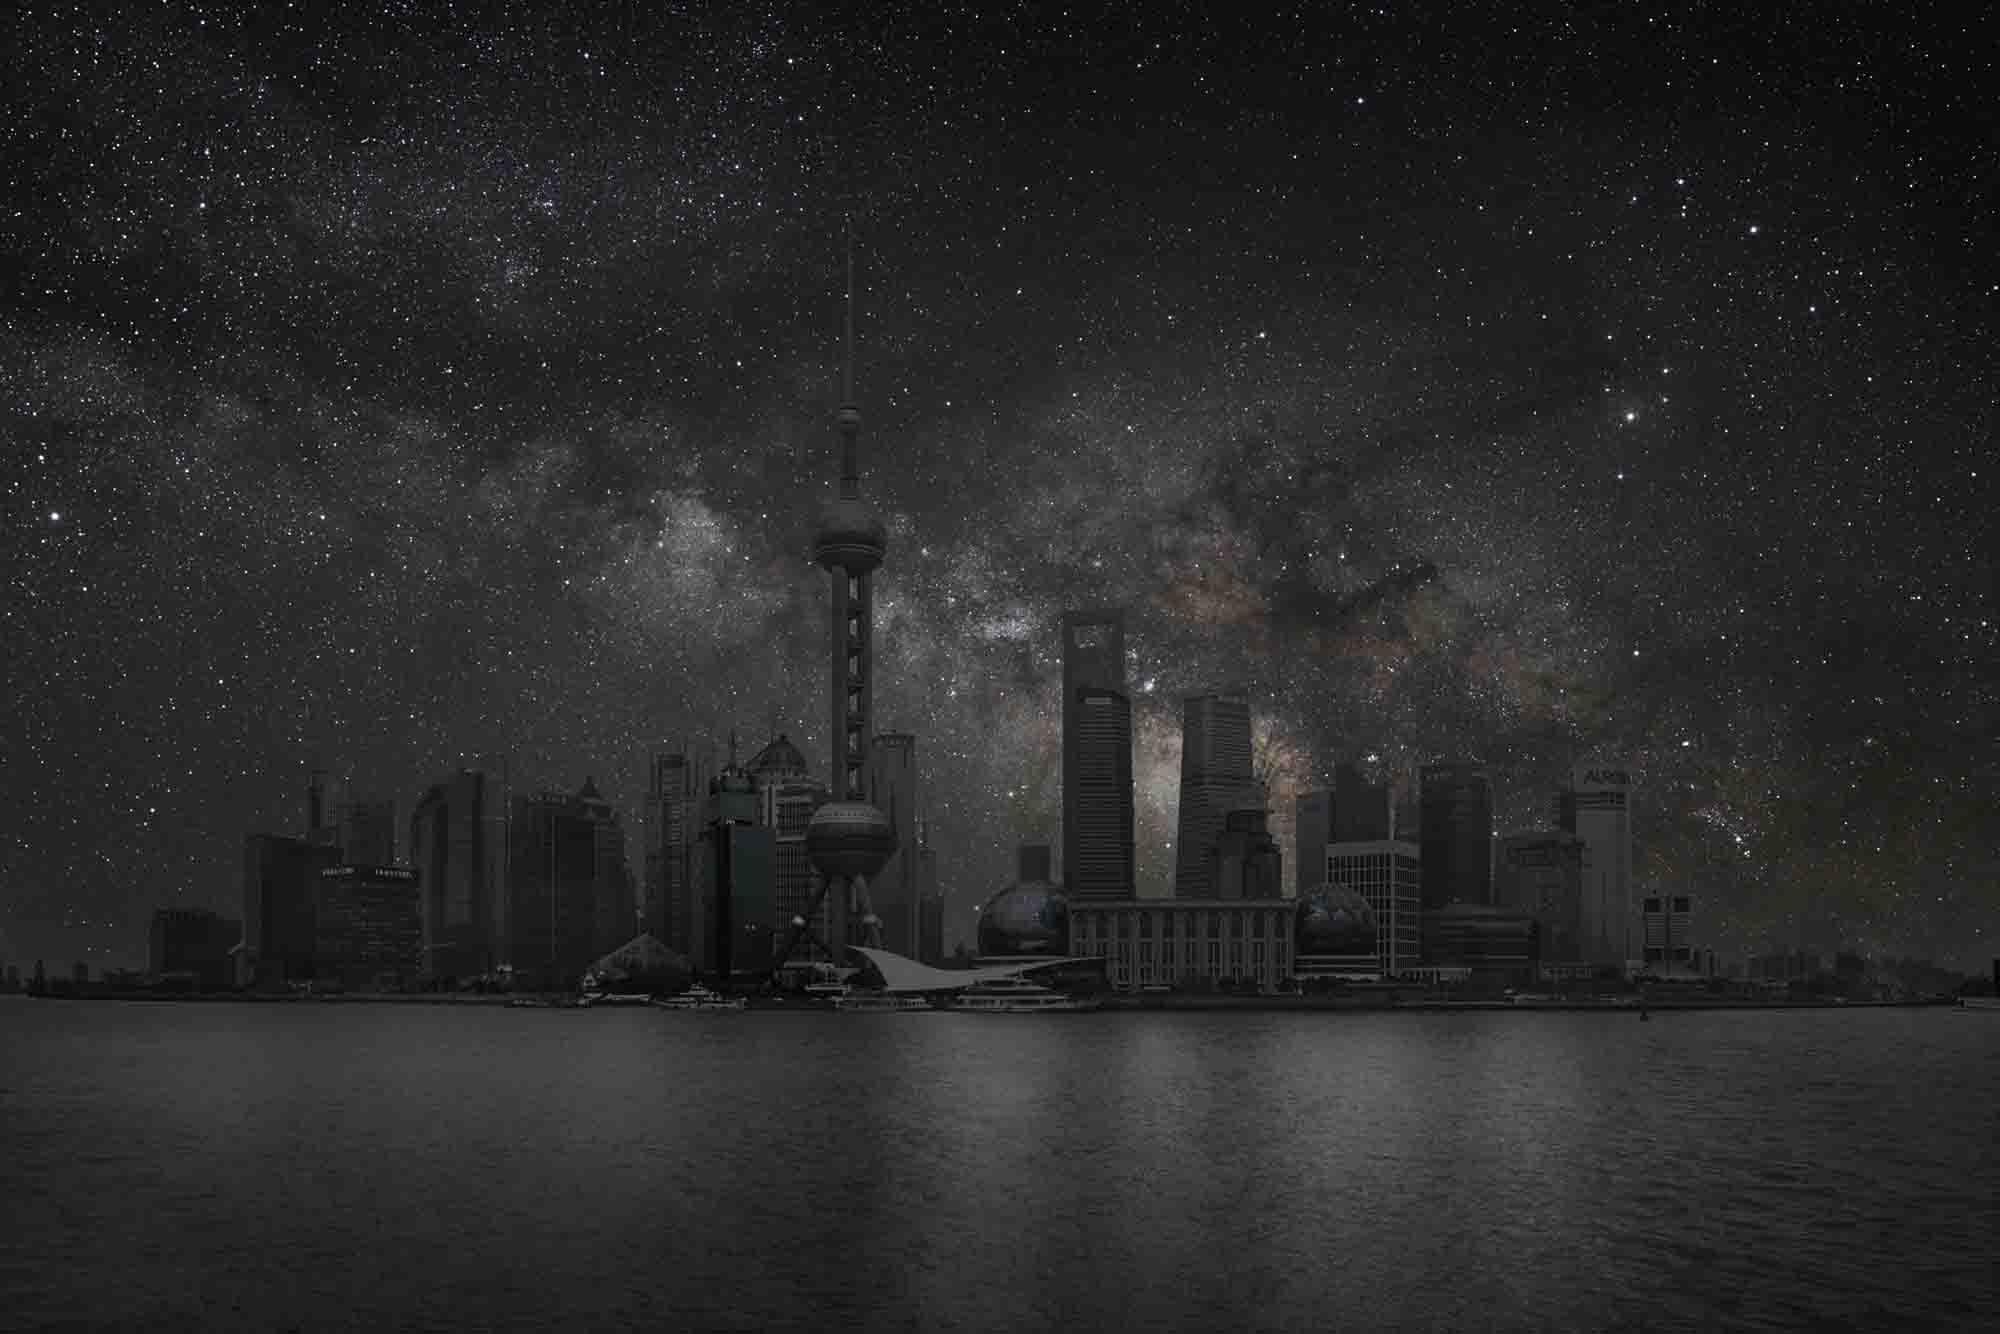 Shanghai 31° 14' 39'' N 2012-03-19 lst 14:42<br/>Darkened Cities - Villes éteintes